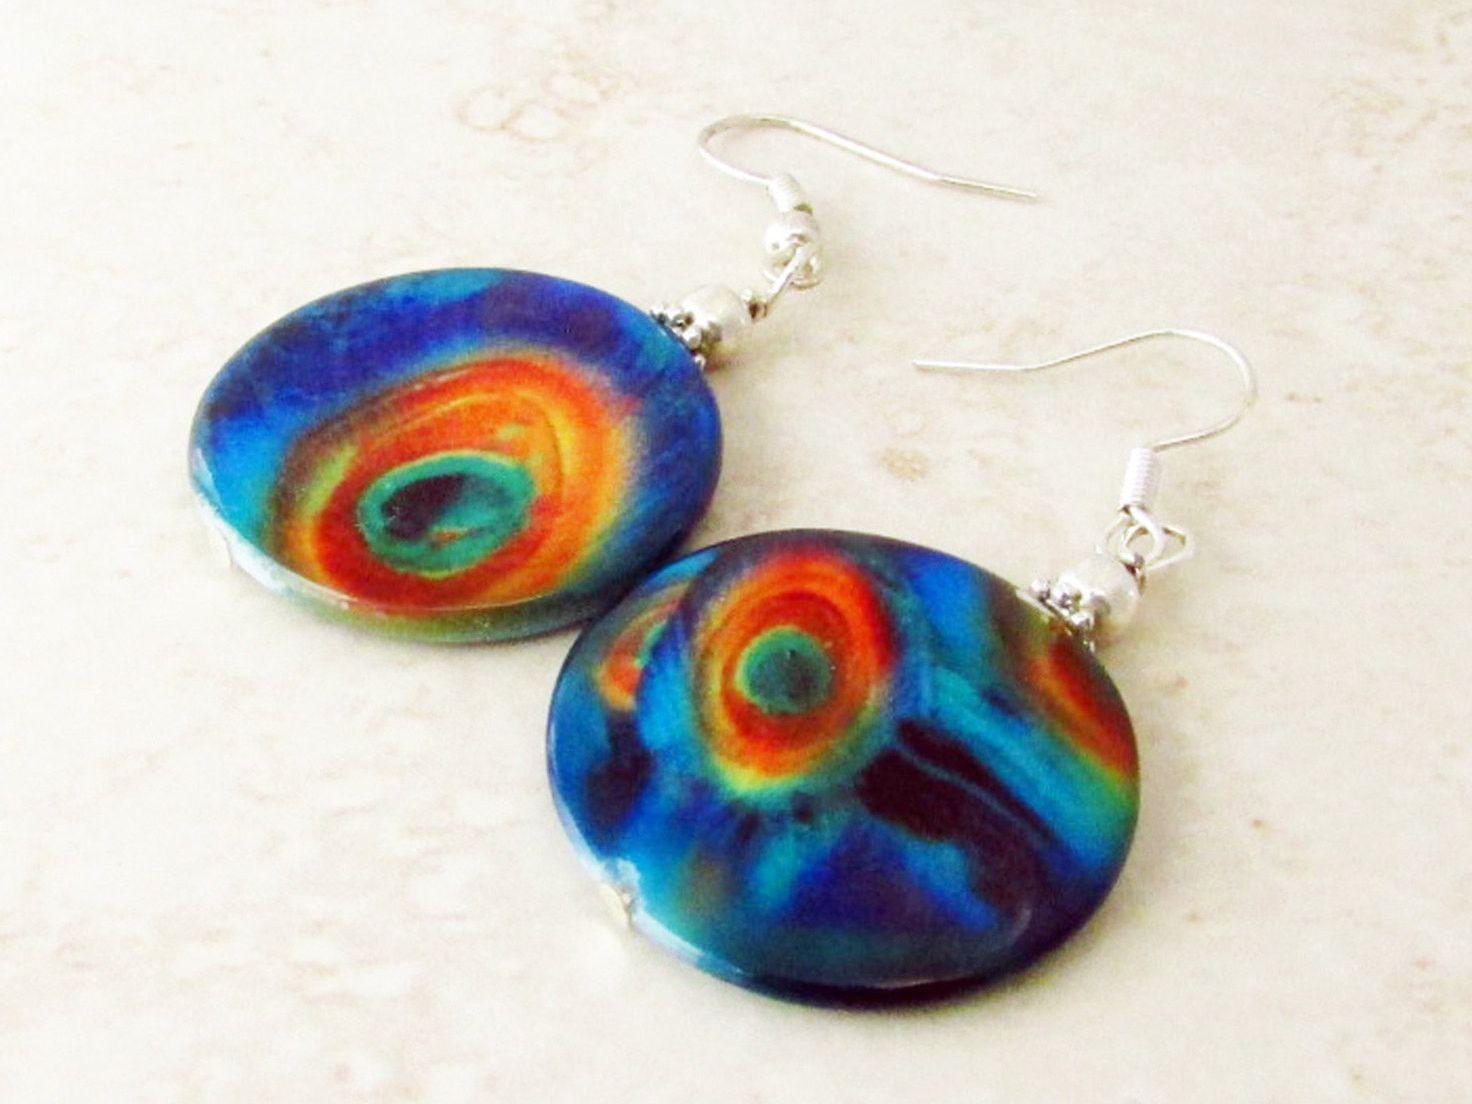 Peacock Earrings, Colorful Earrings, Dangle Earrings, Circle Earrings, Peacock Jewelry